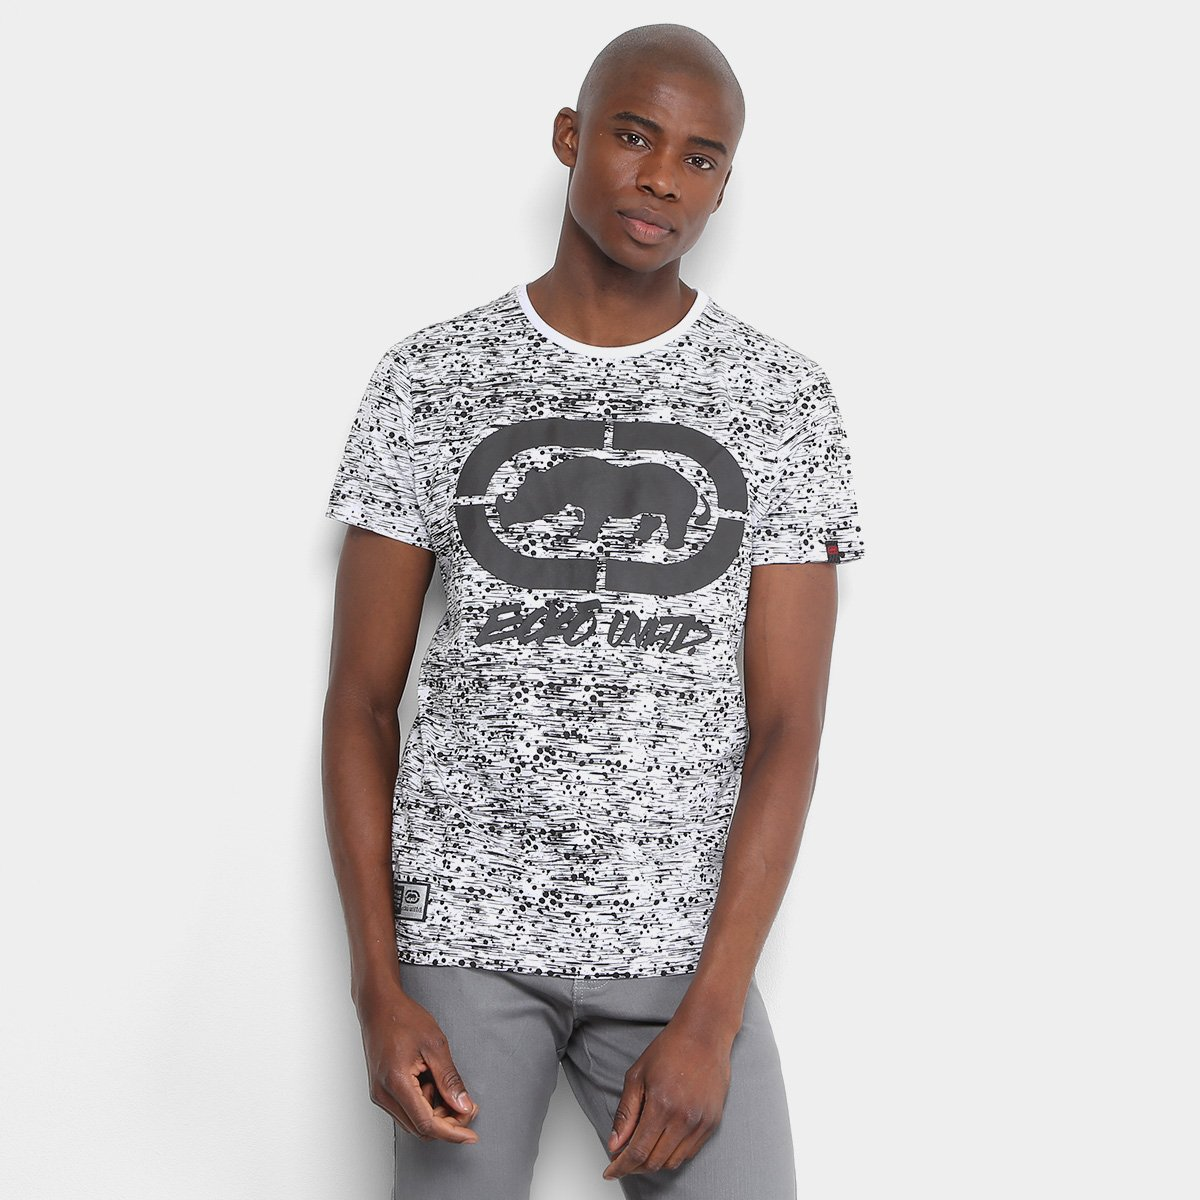 338a793b37e Camiseta Ecko Especial Masculina - Compre Agora